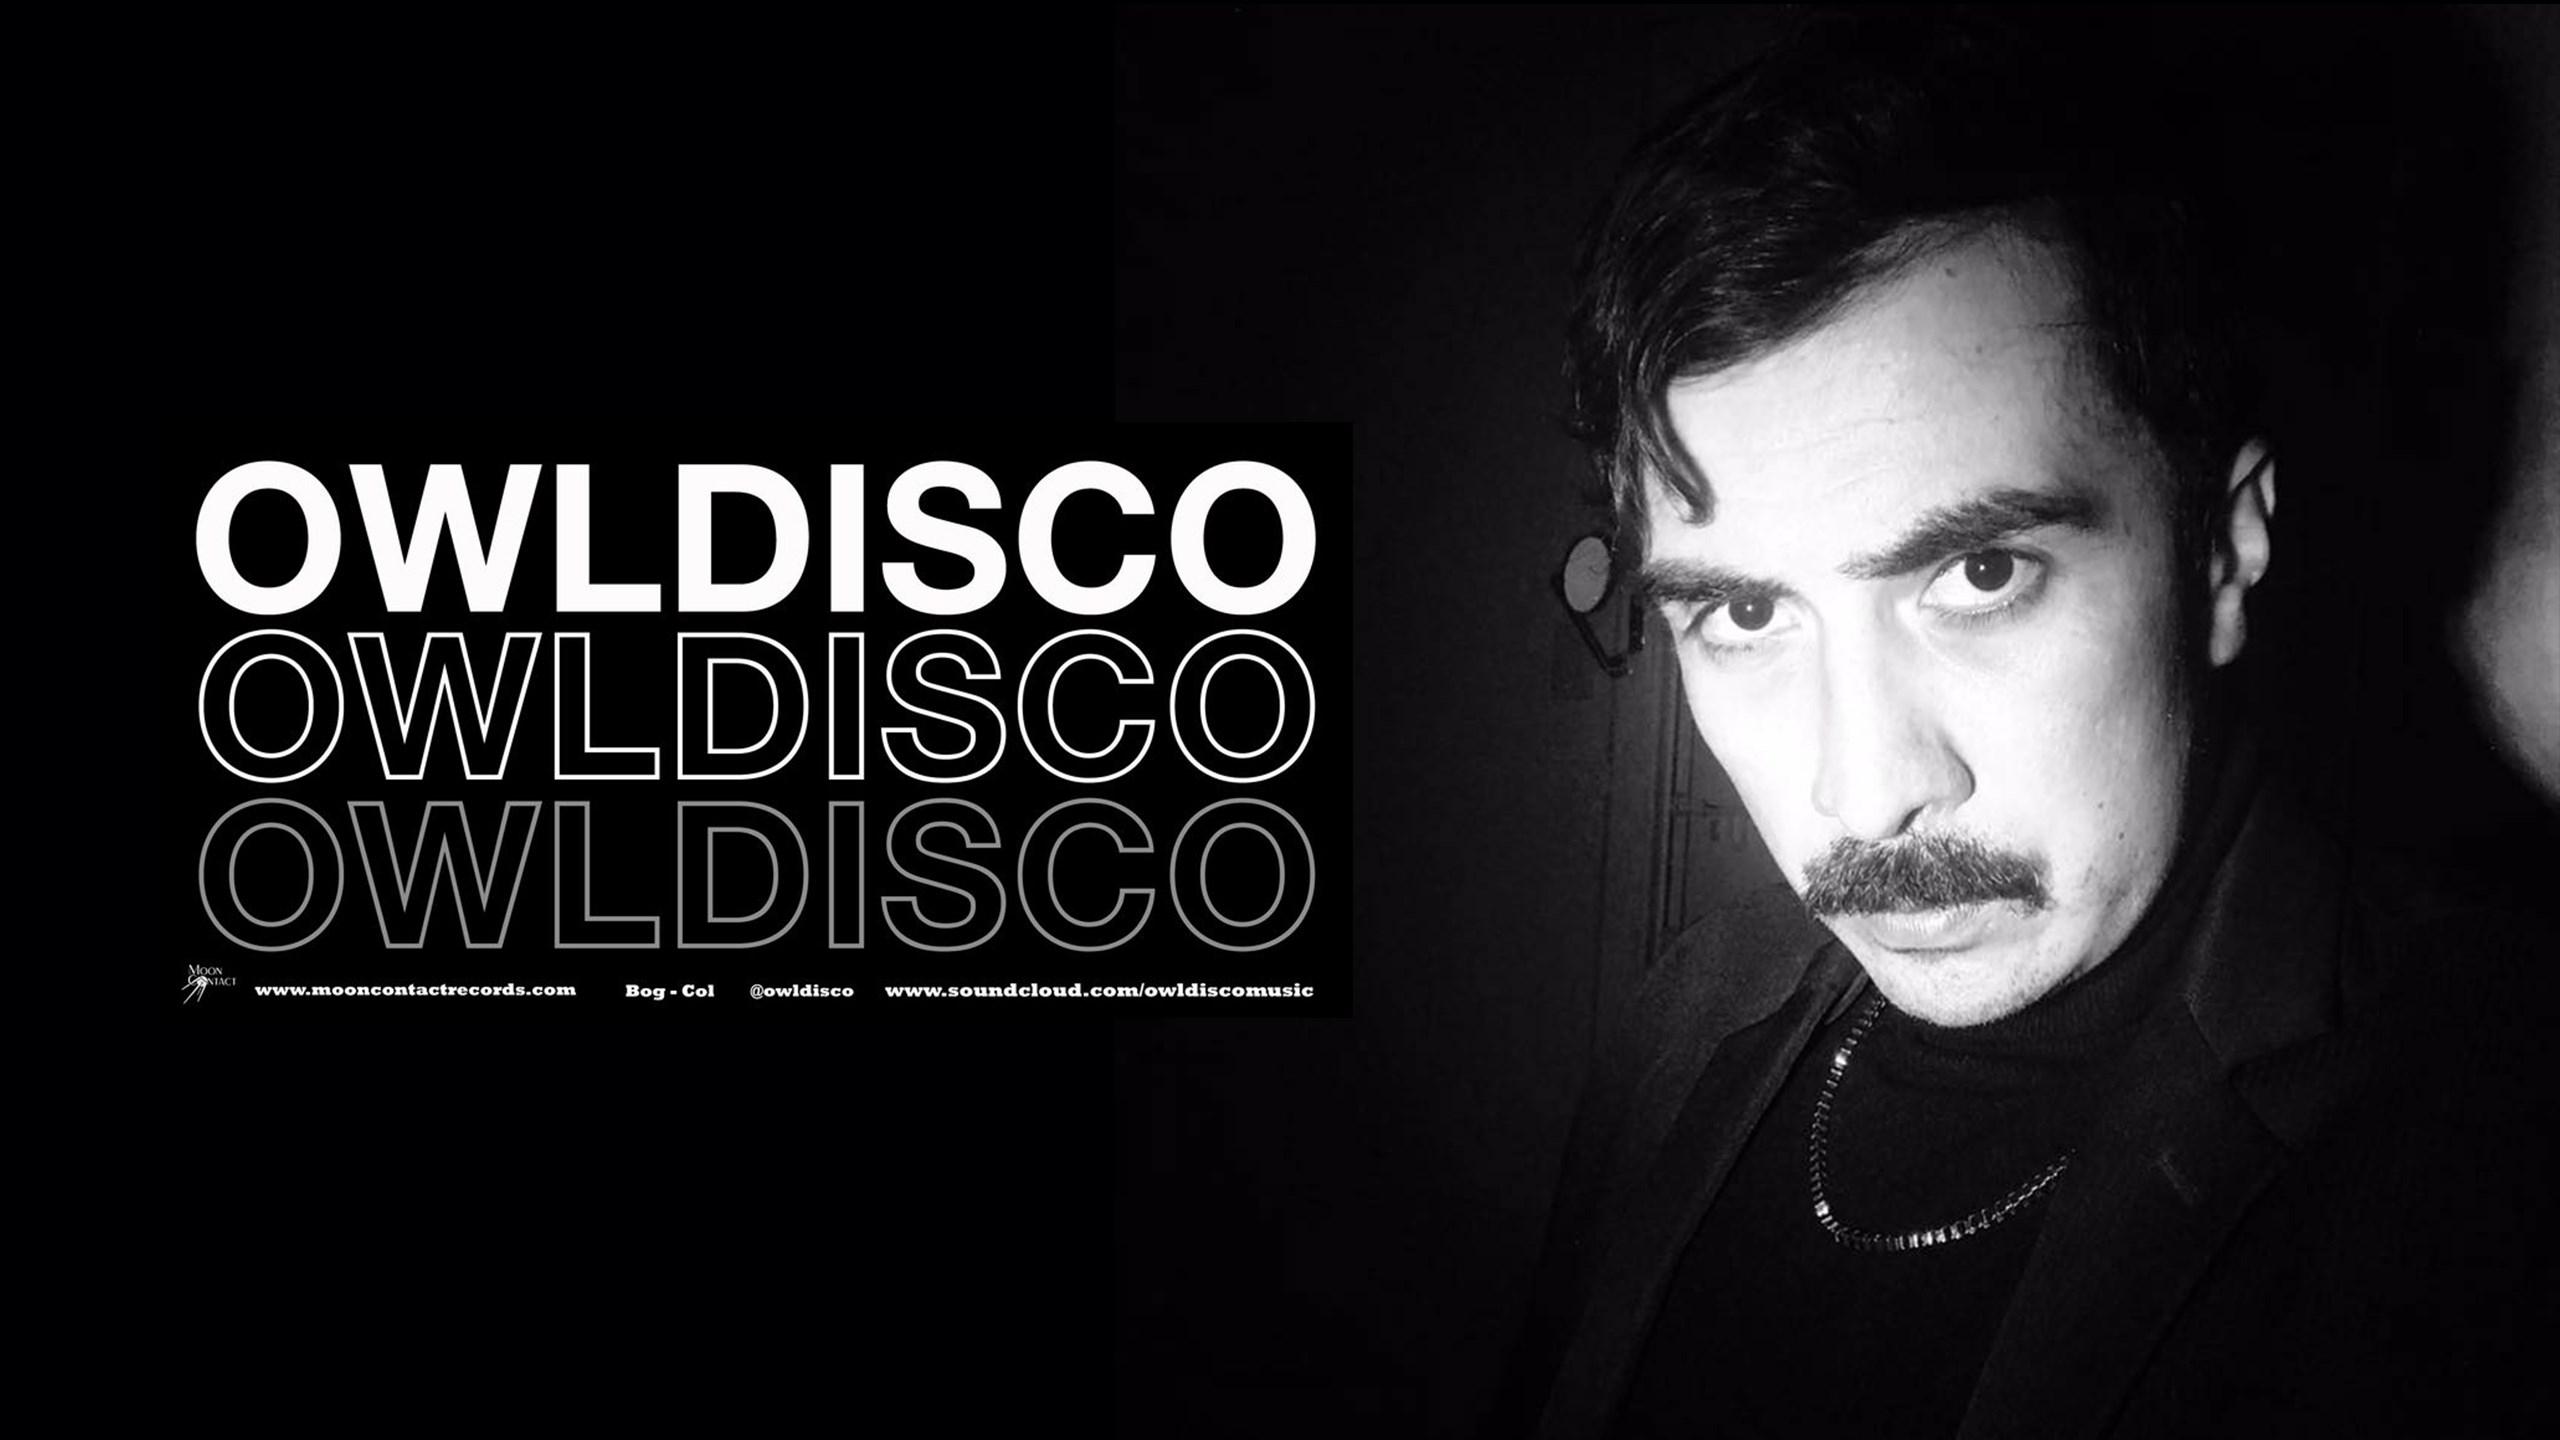 Cover image for Owldisco